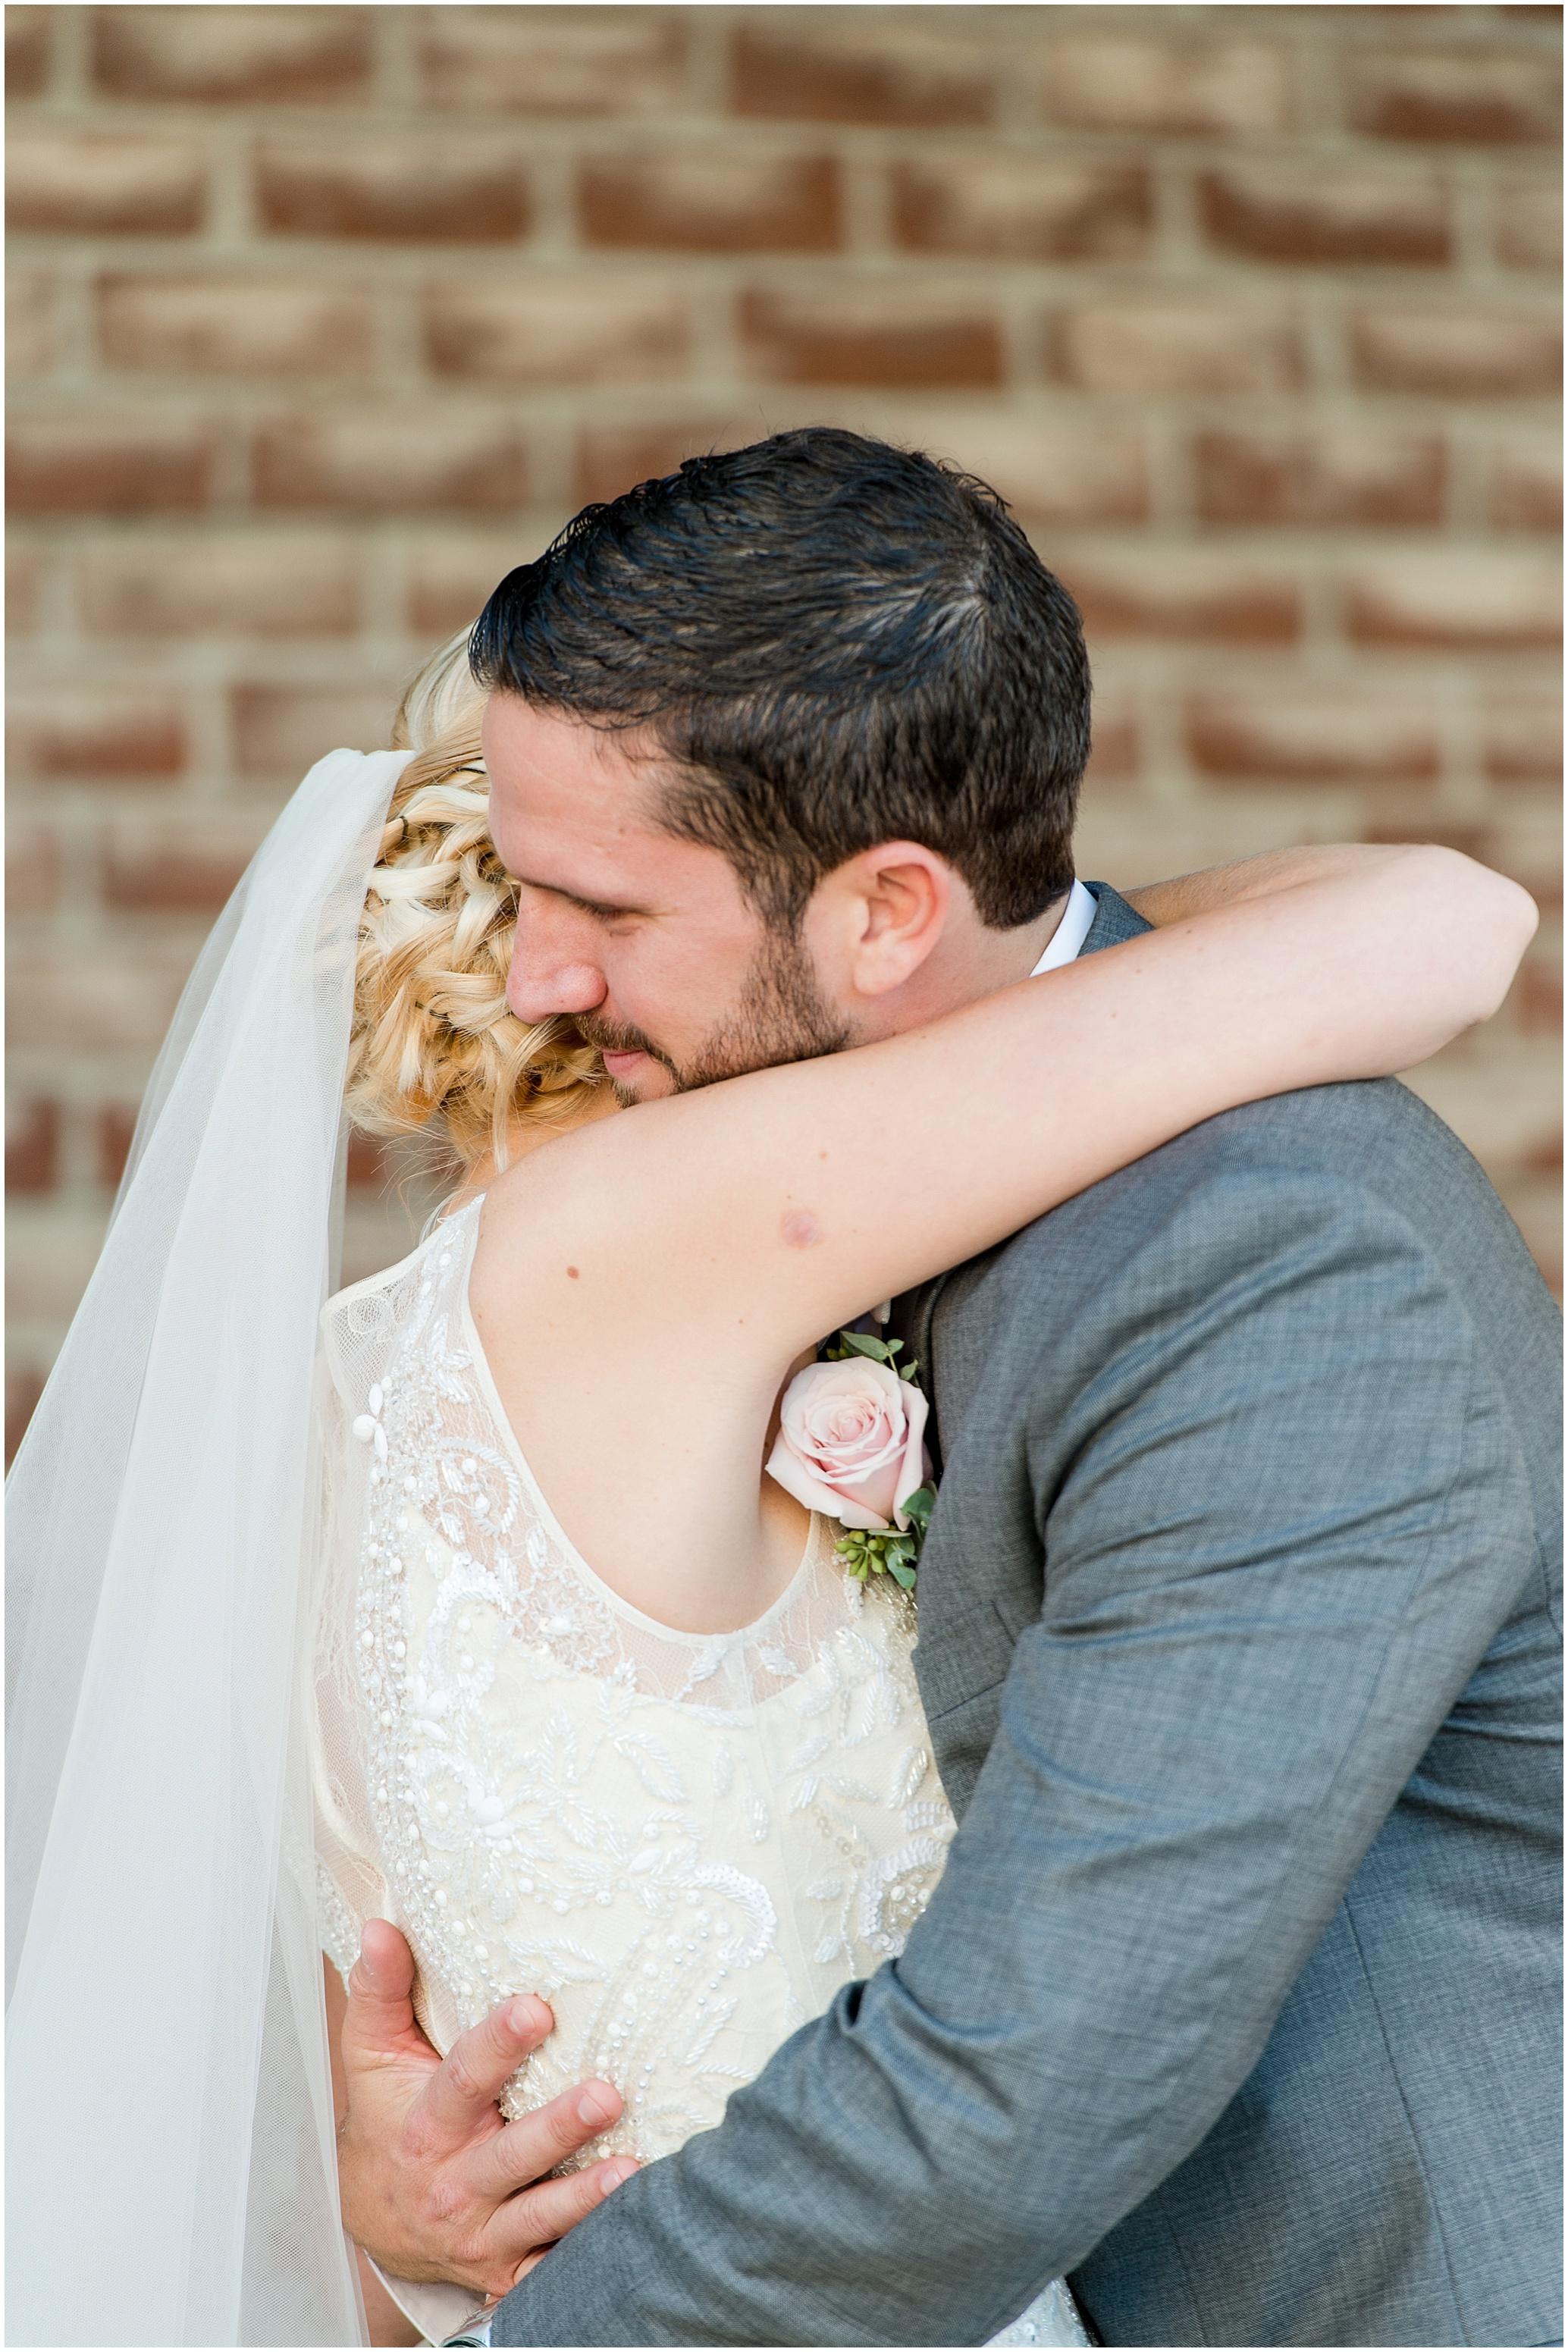 Hannah Leigh Photography Tabrizis Baltimore Wedding_2212.jpg